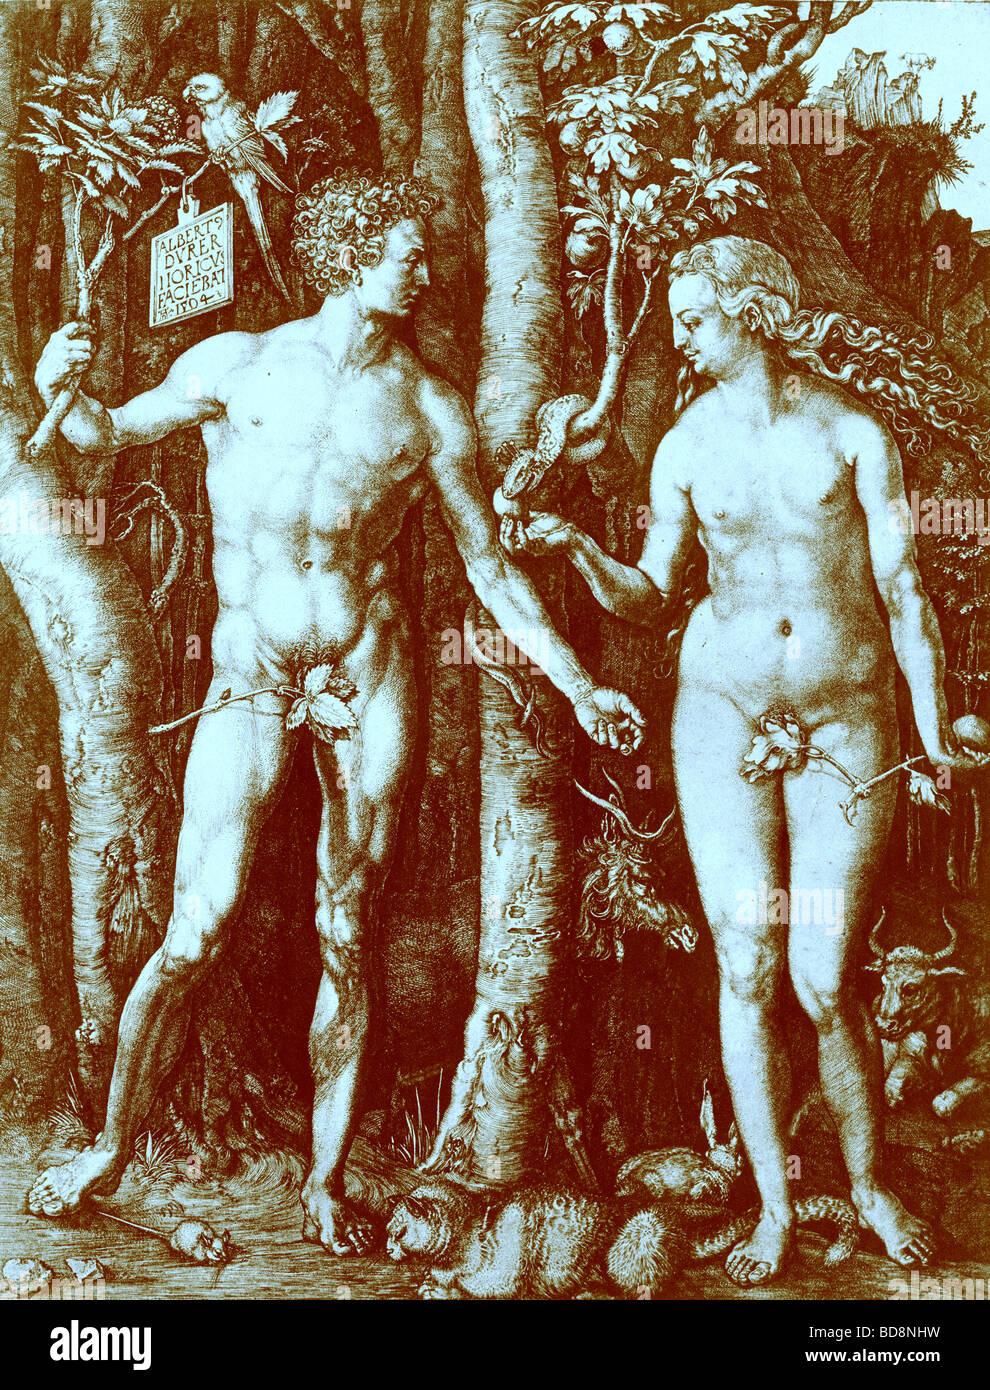 adam and eve 1504 from reproduction in albrecht durer kupferstiche